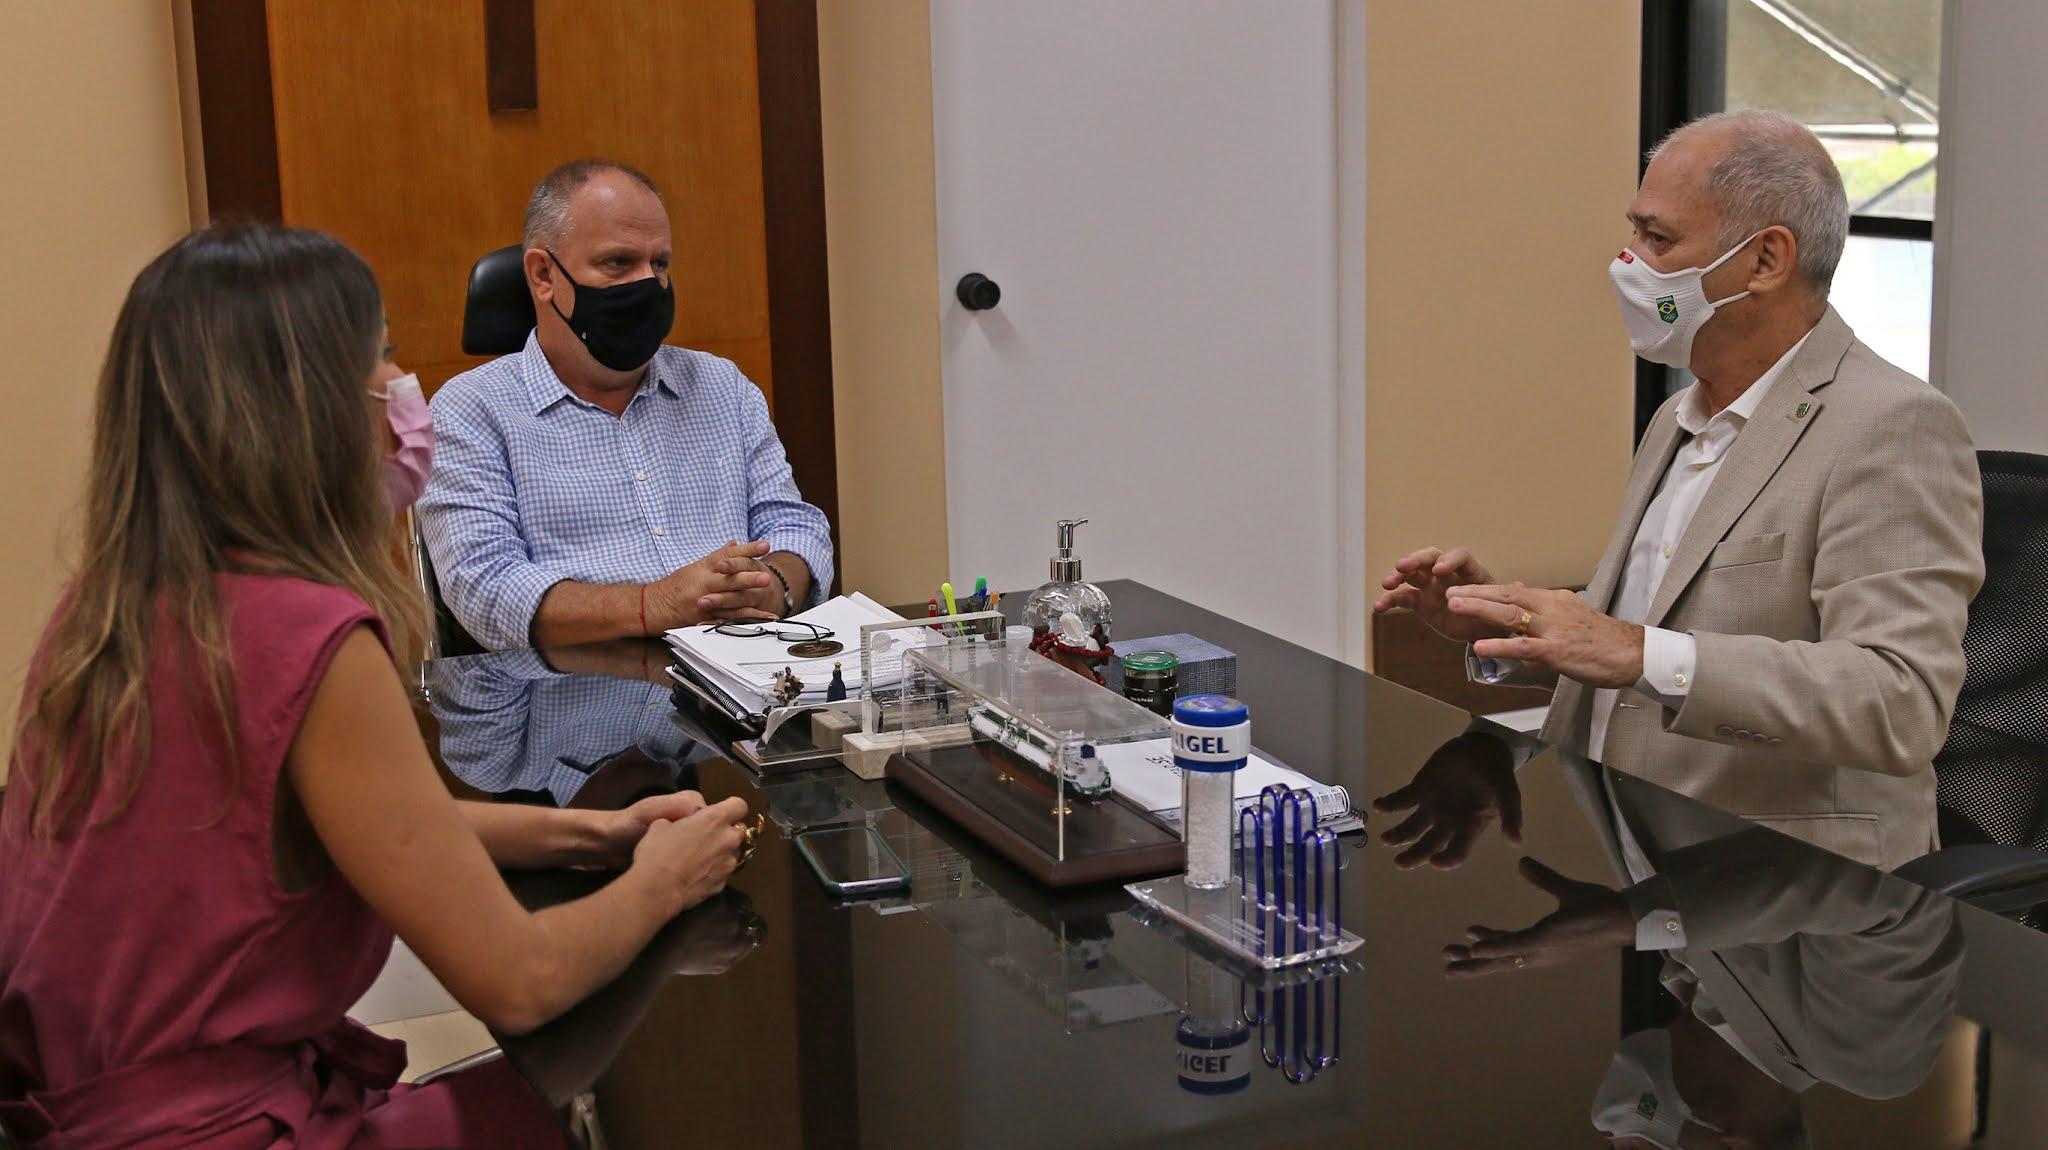 Em uma mesa, Paulo Wanderley, Belivaldo Chagas, Mariana Dantas